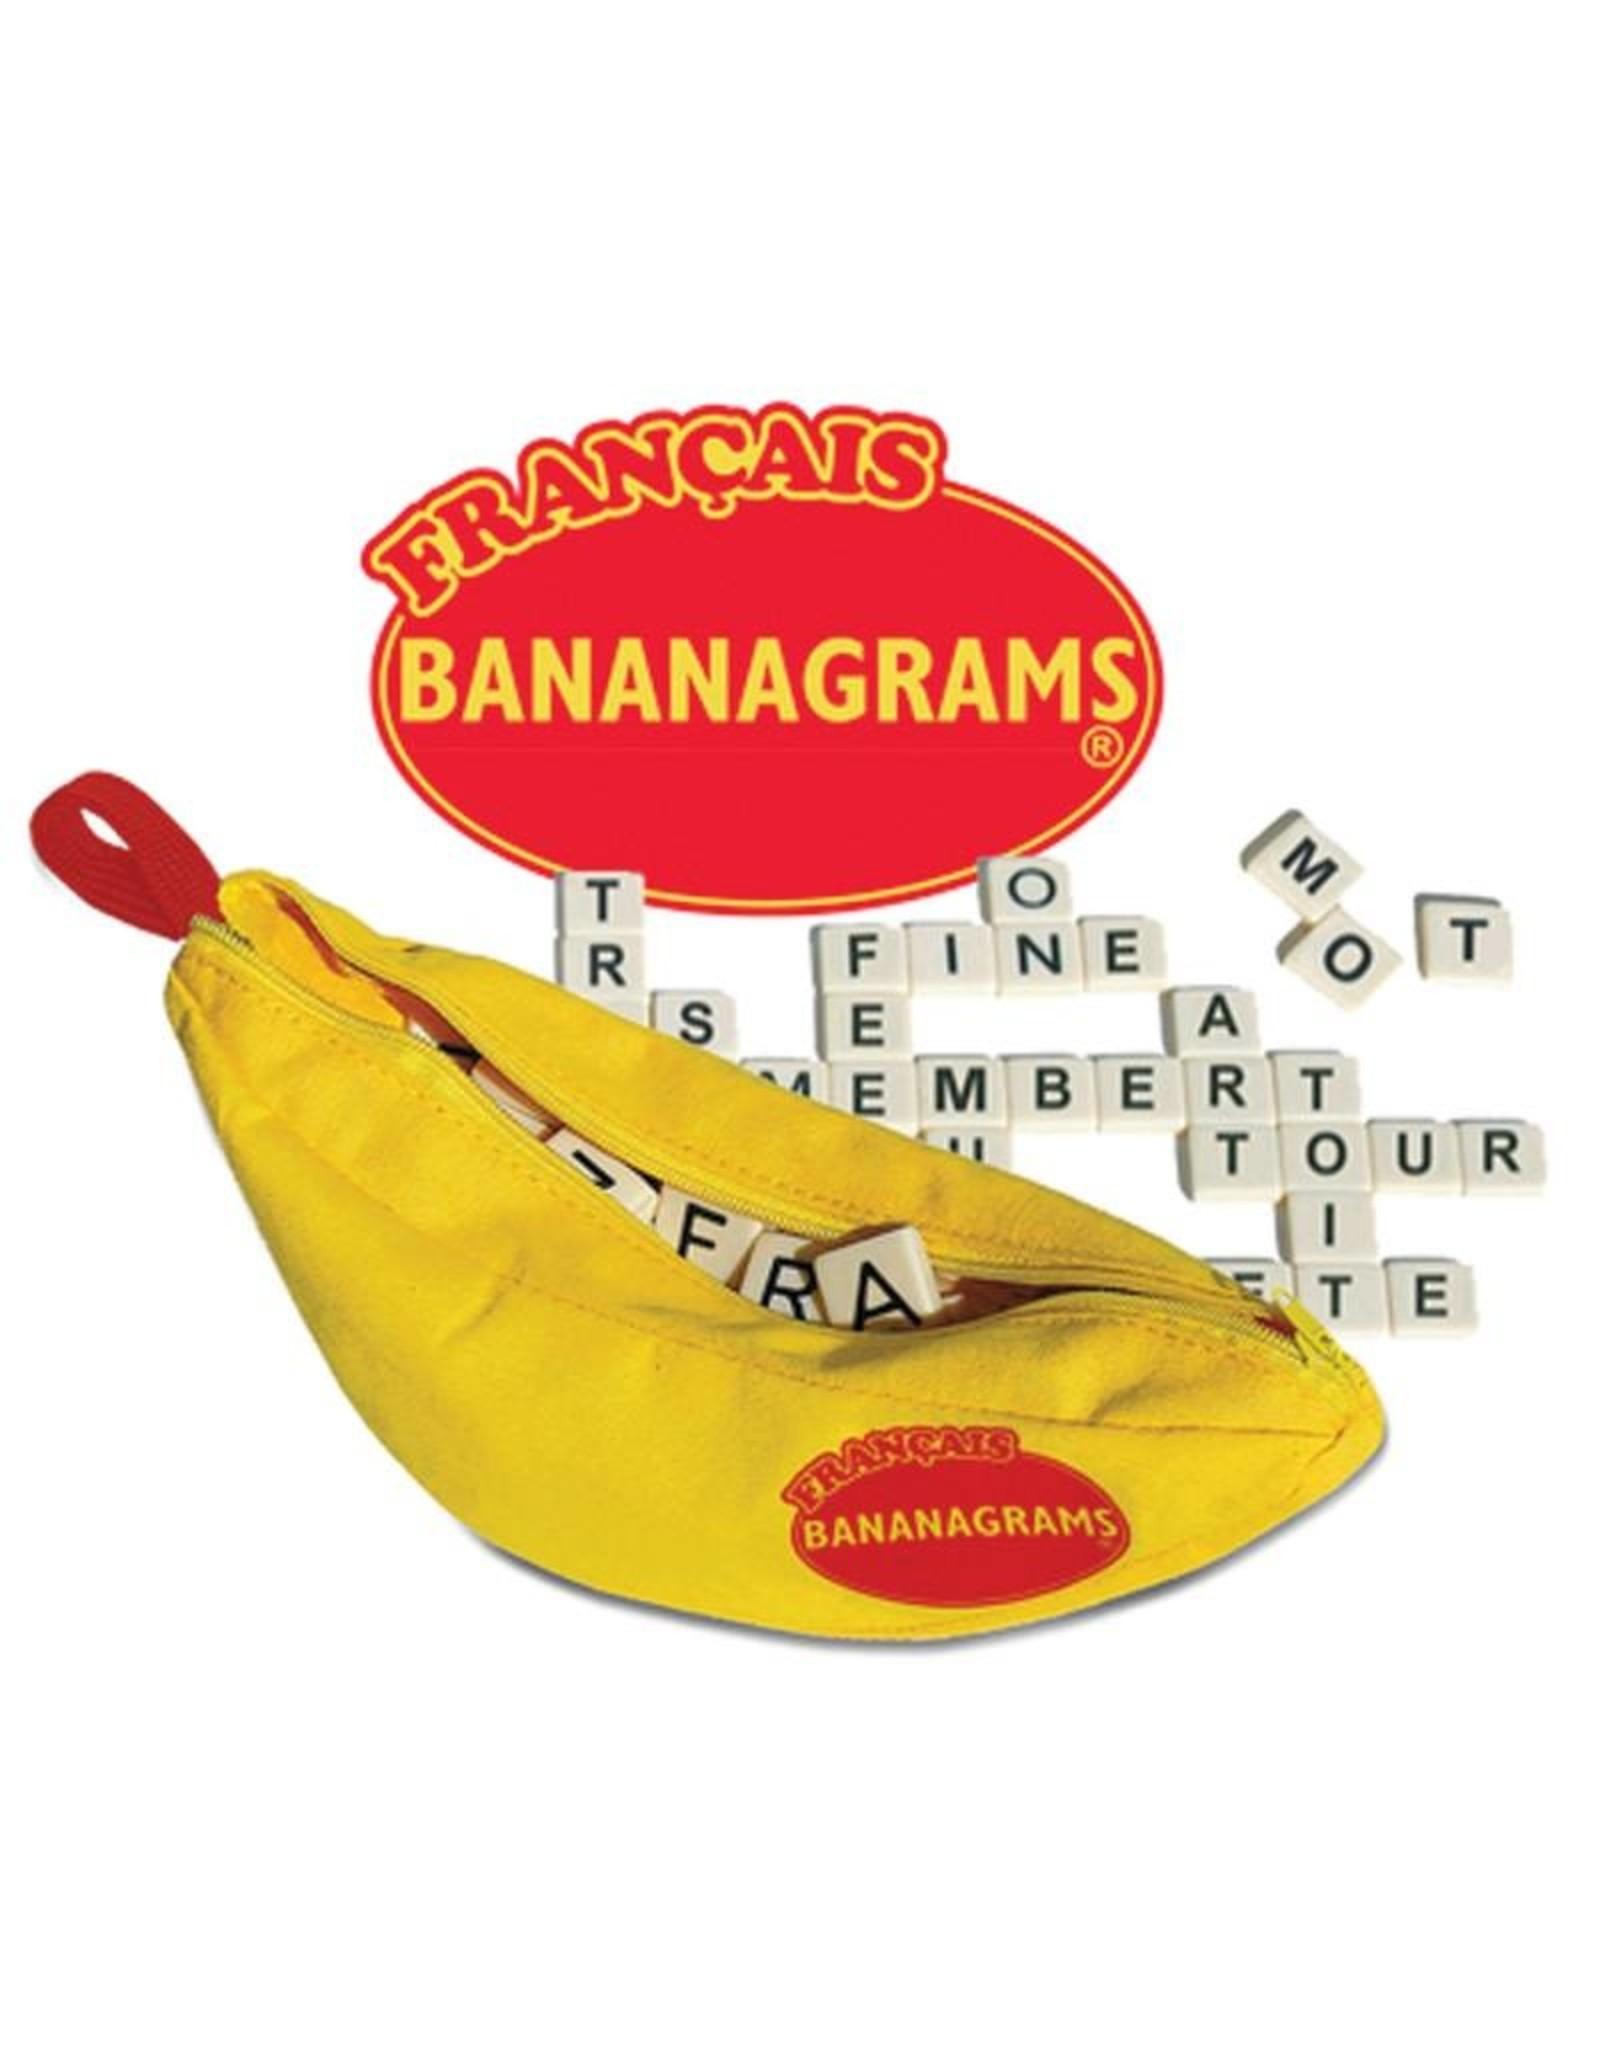 Bananagrams Bananagrams - French